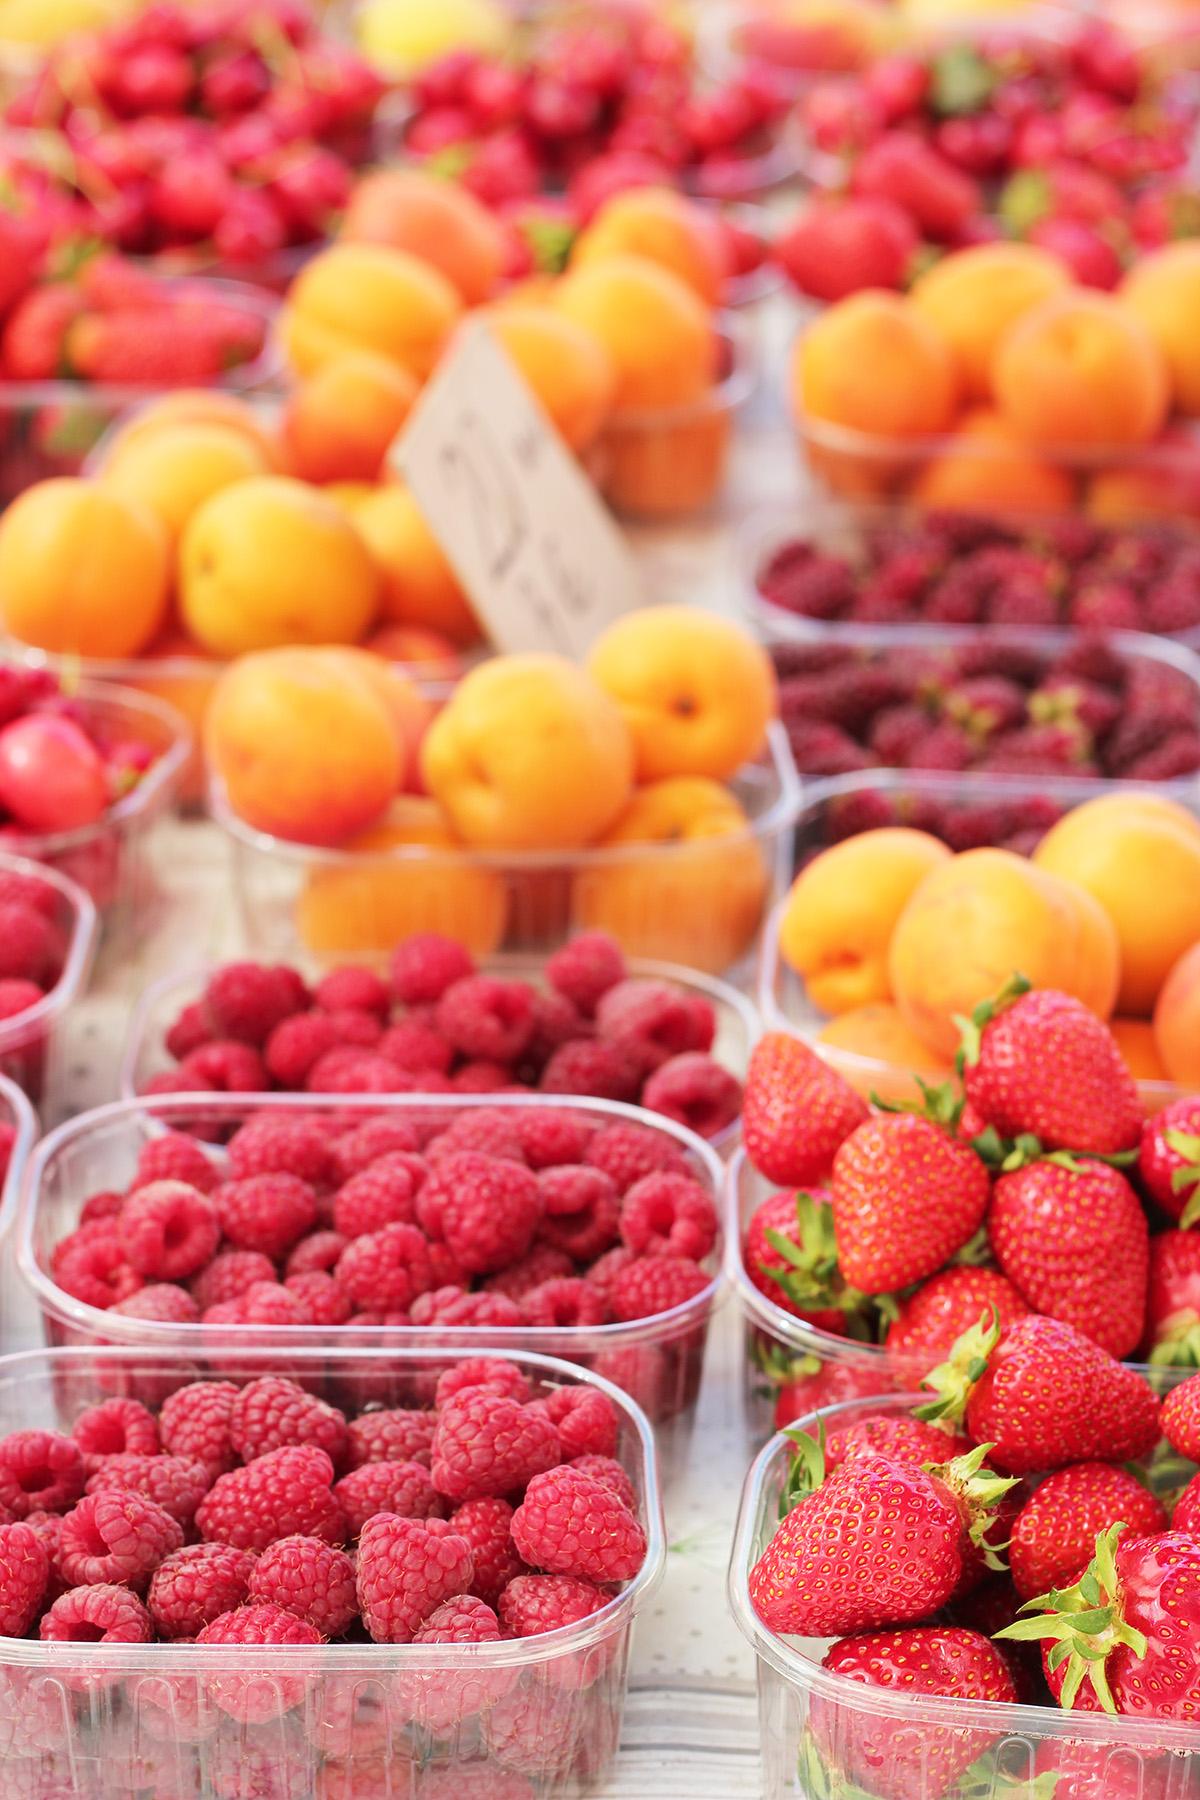 pjaca dubrovnik green market organic food go dubrovnik (1)